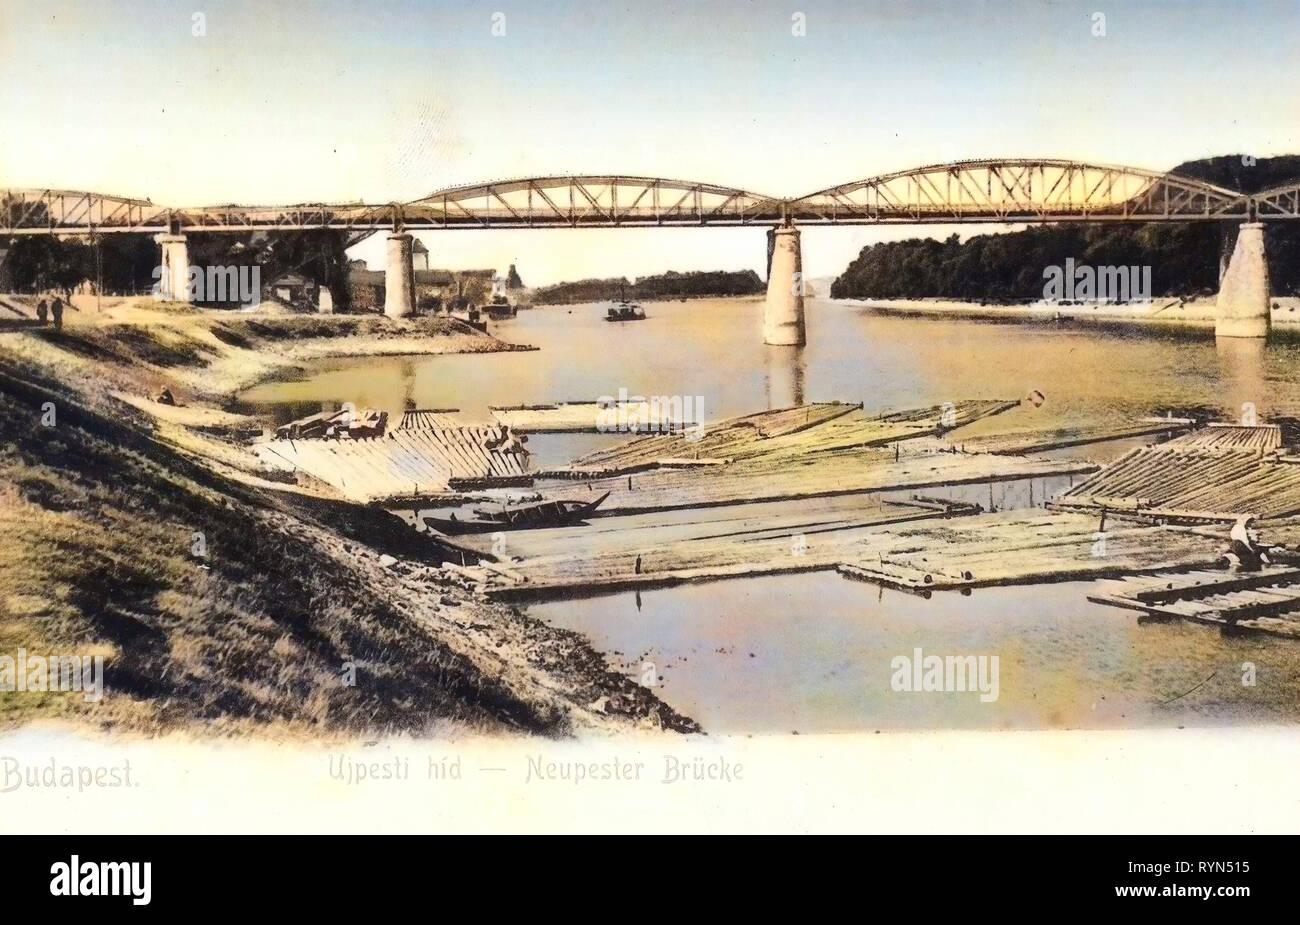 Újpesti vasúti híd, Logging, 1904, Budapest, Neupester Brücke mit Holzflößen, Hungary - Stock Image